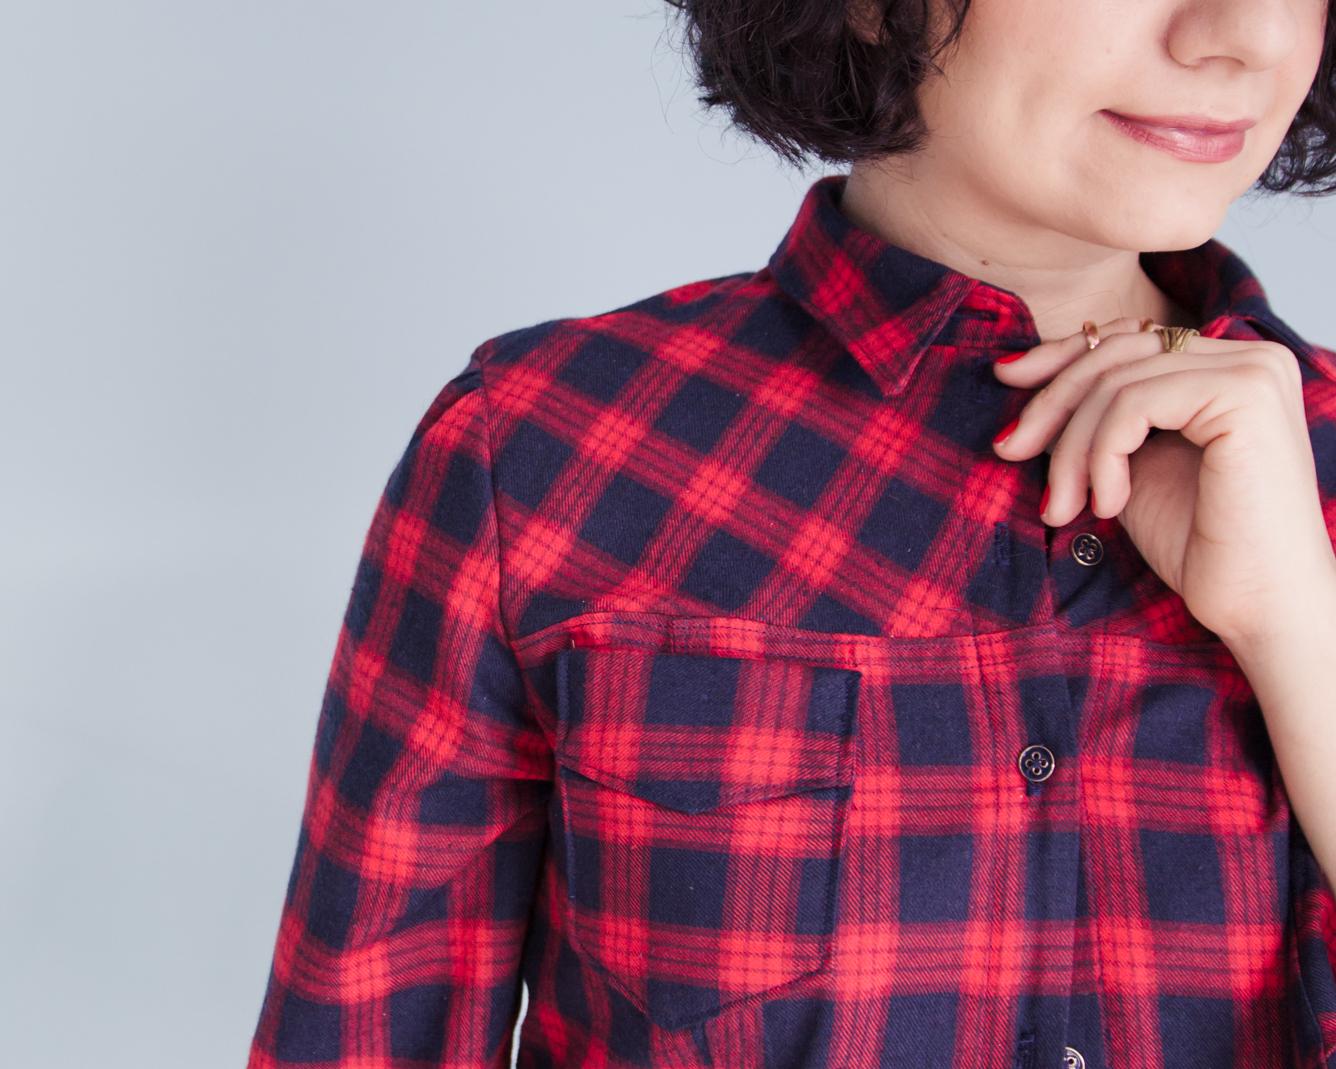 Schnittmuster karierte Bluse nähen - Rot karierte Bluse im Holzfällerstil - Rosa von Tilly & The Buttons Tweed & Greet-8